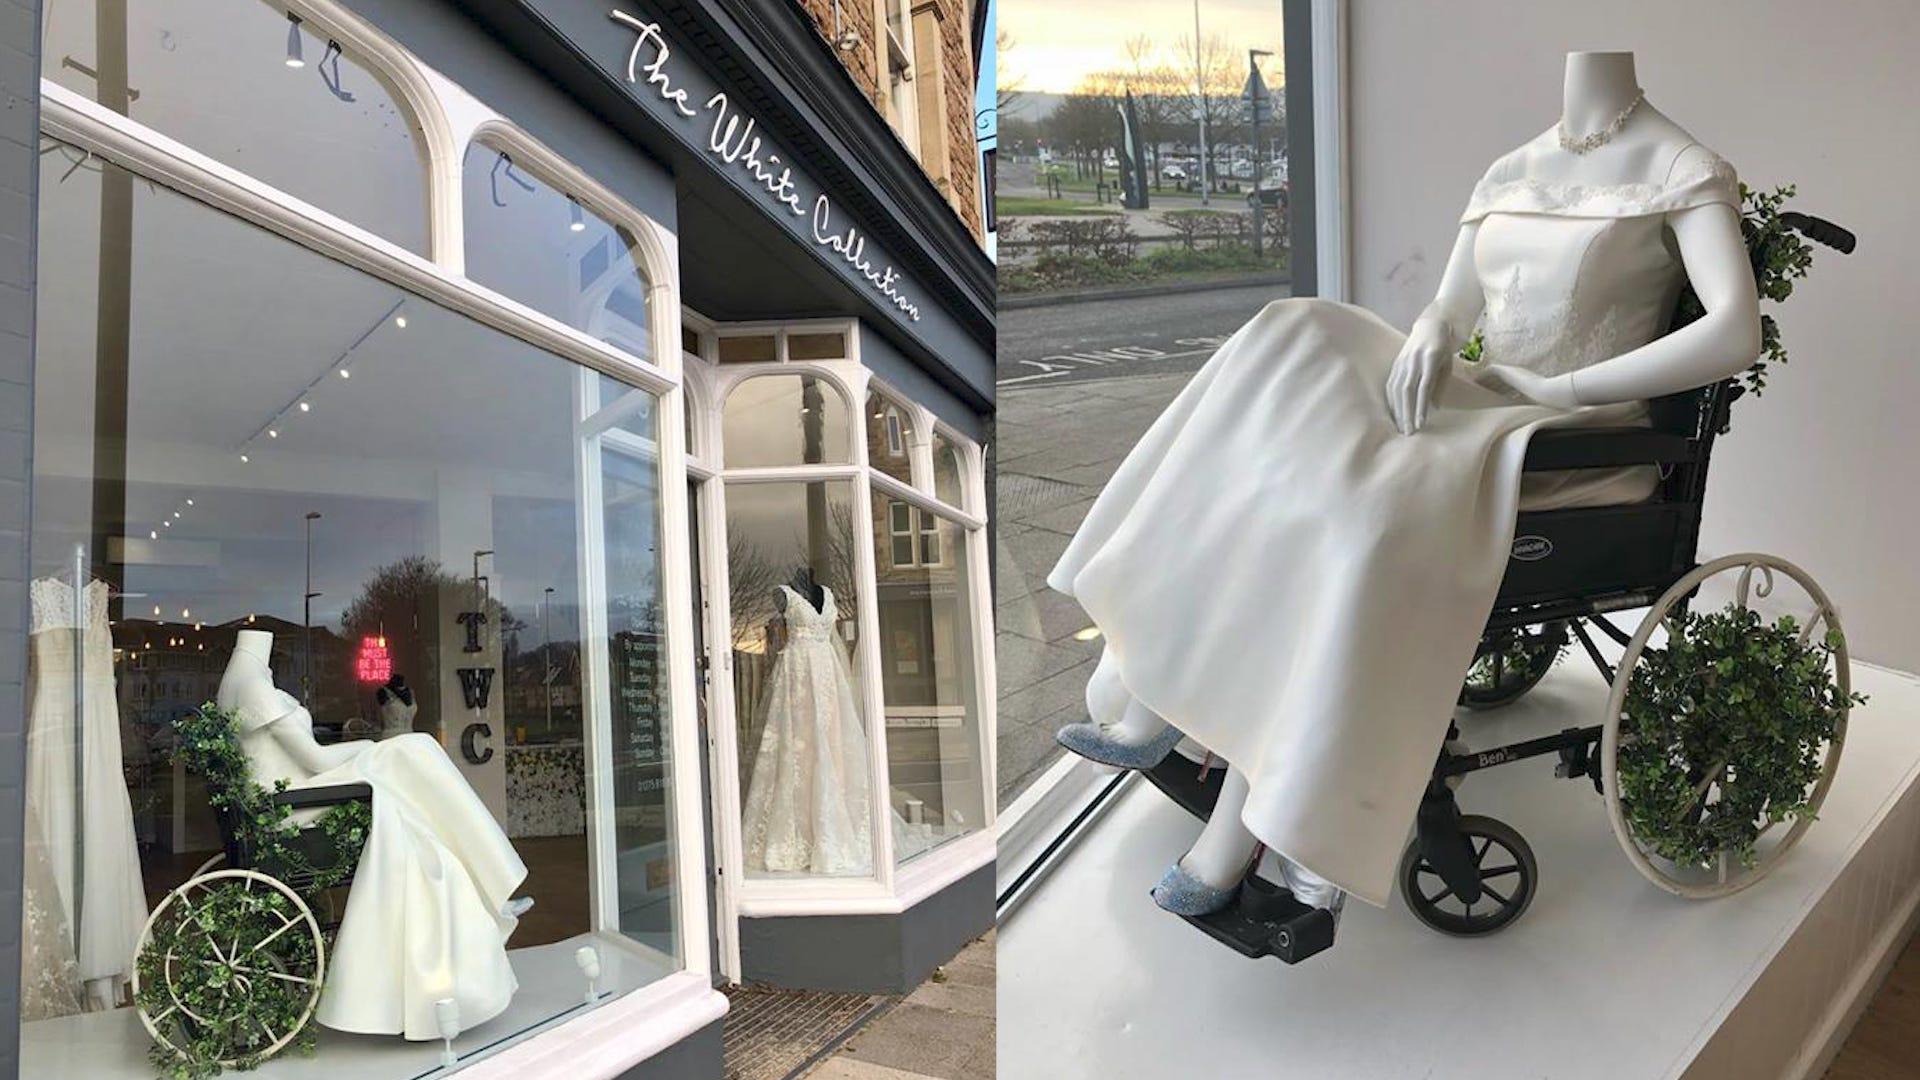 58f732c2d5 Wedding Boutique Praised for Putting Mannequin in Wheelchair